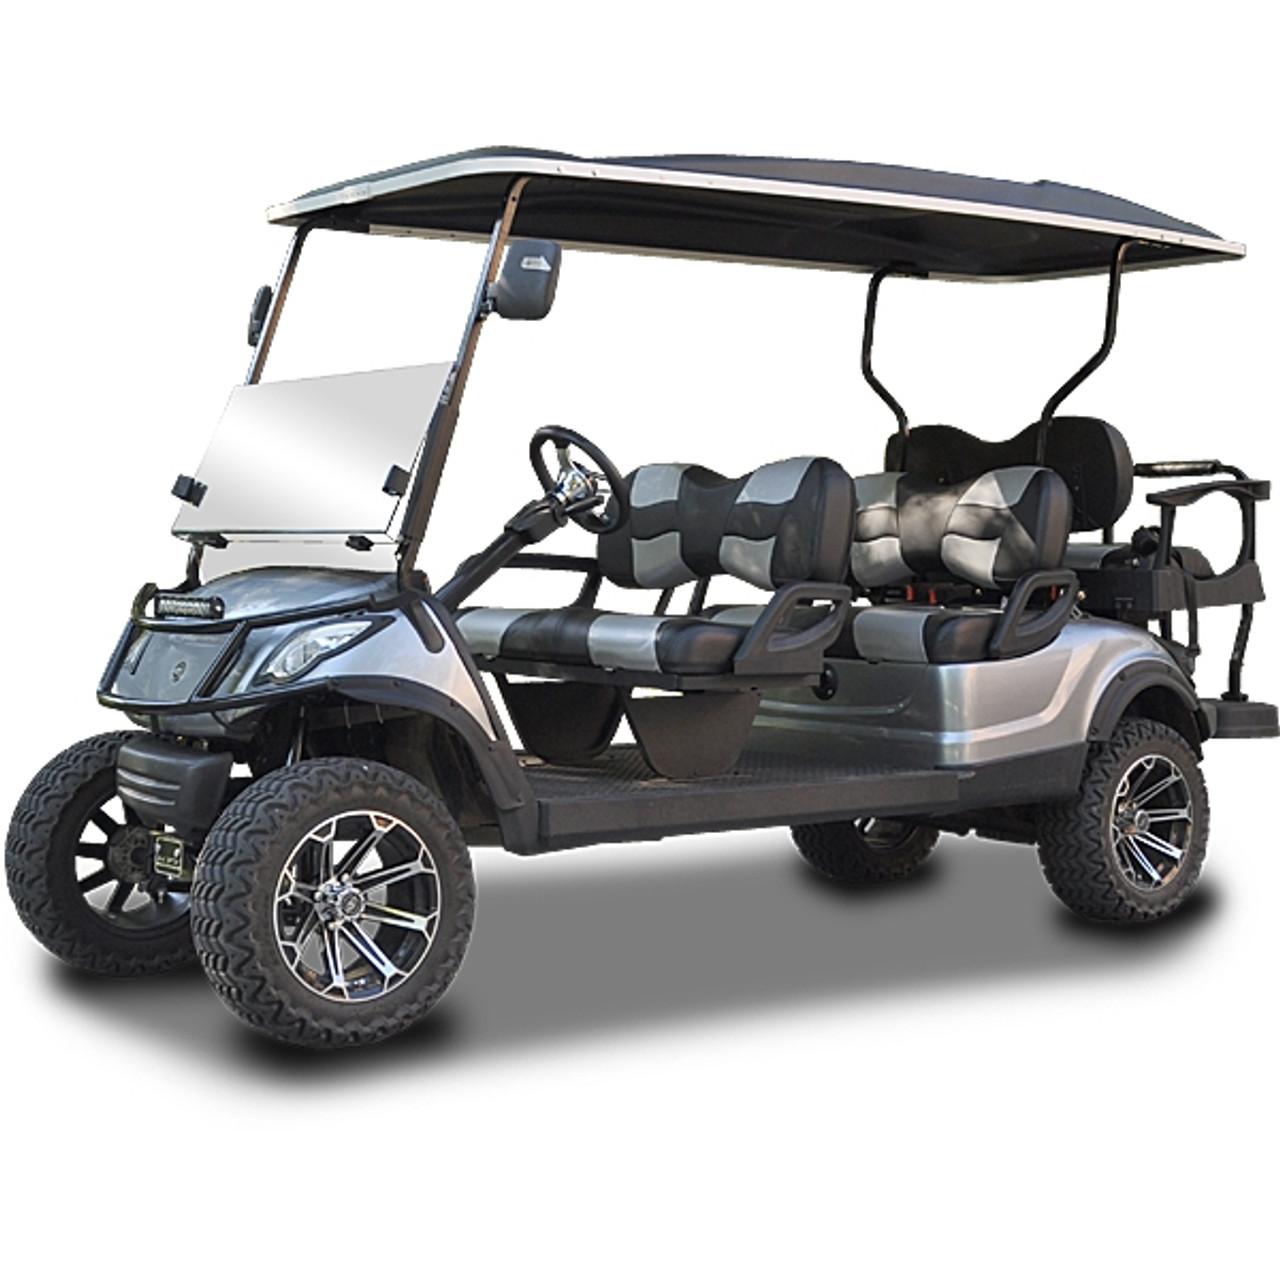 Madjax Yamaha G29 Stretch Kit Precedent Golf Cart King